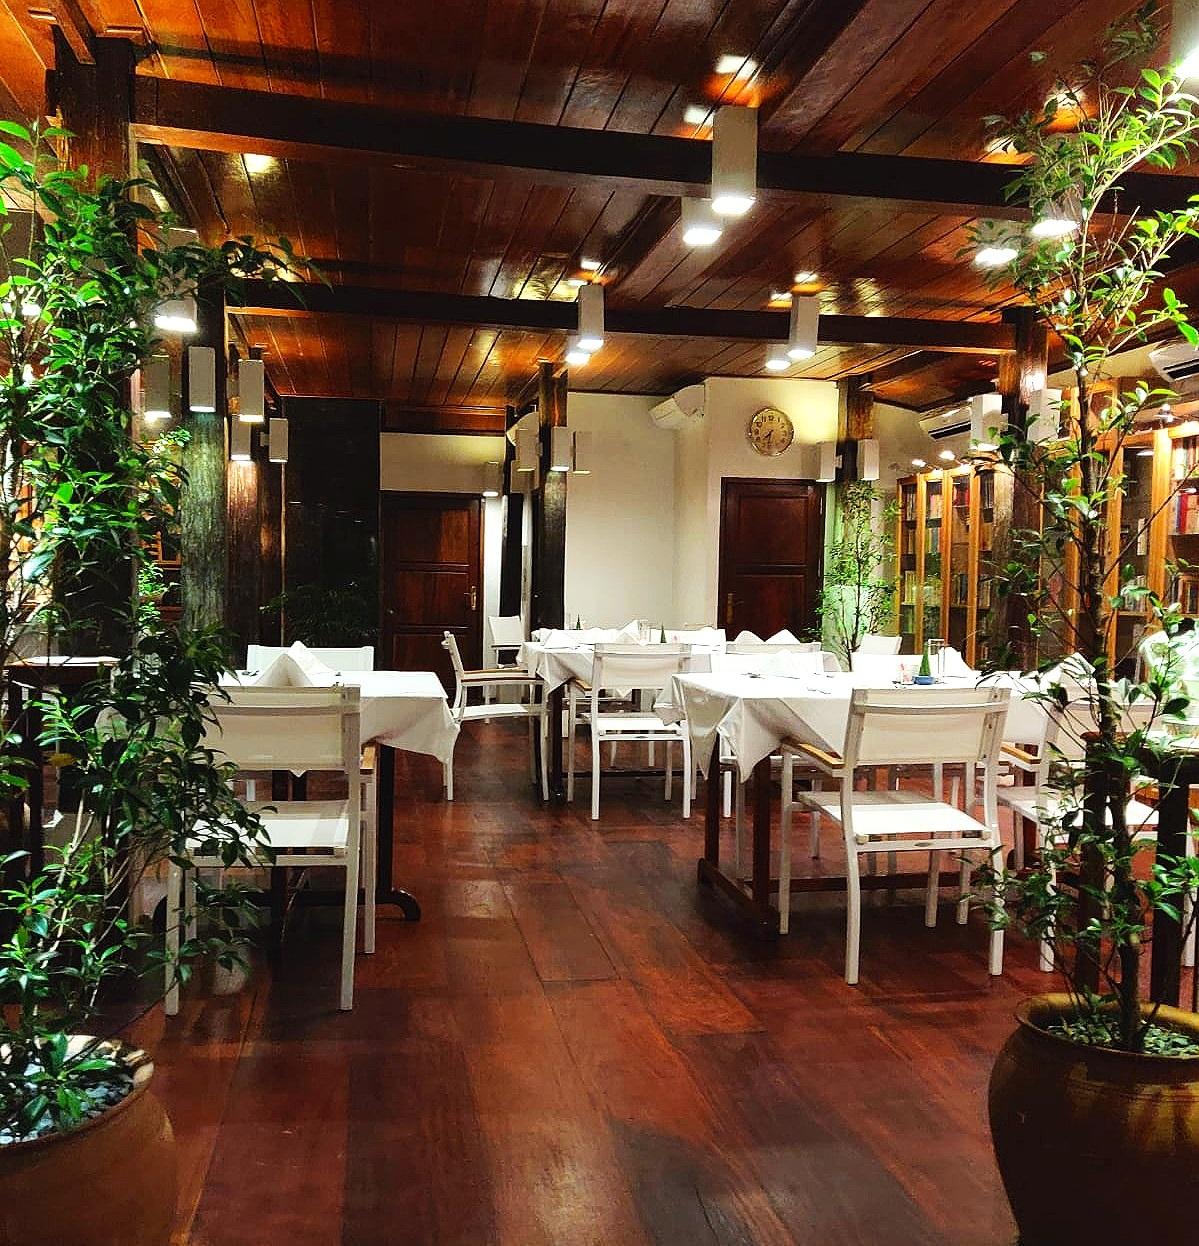 Blue Lagoon has beautiful dark wood flooring and elegant white dining tables